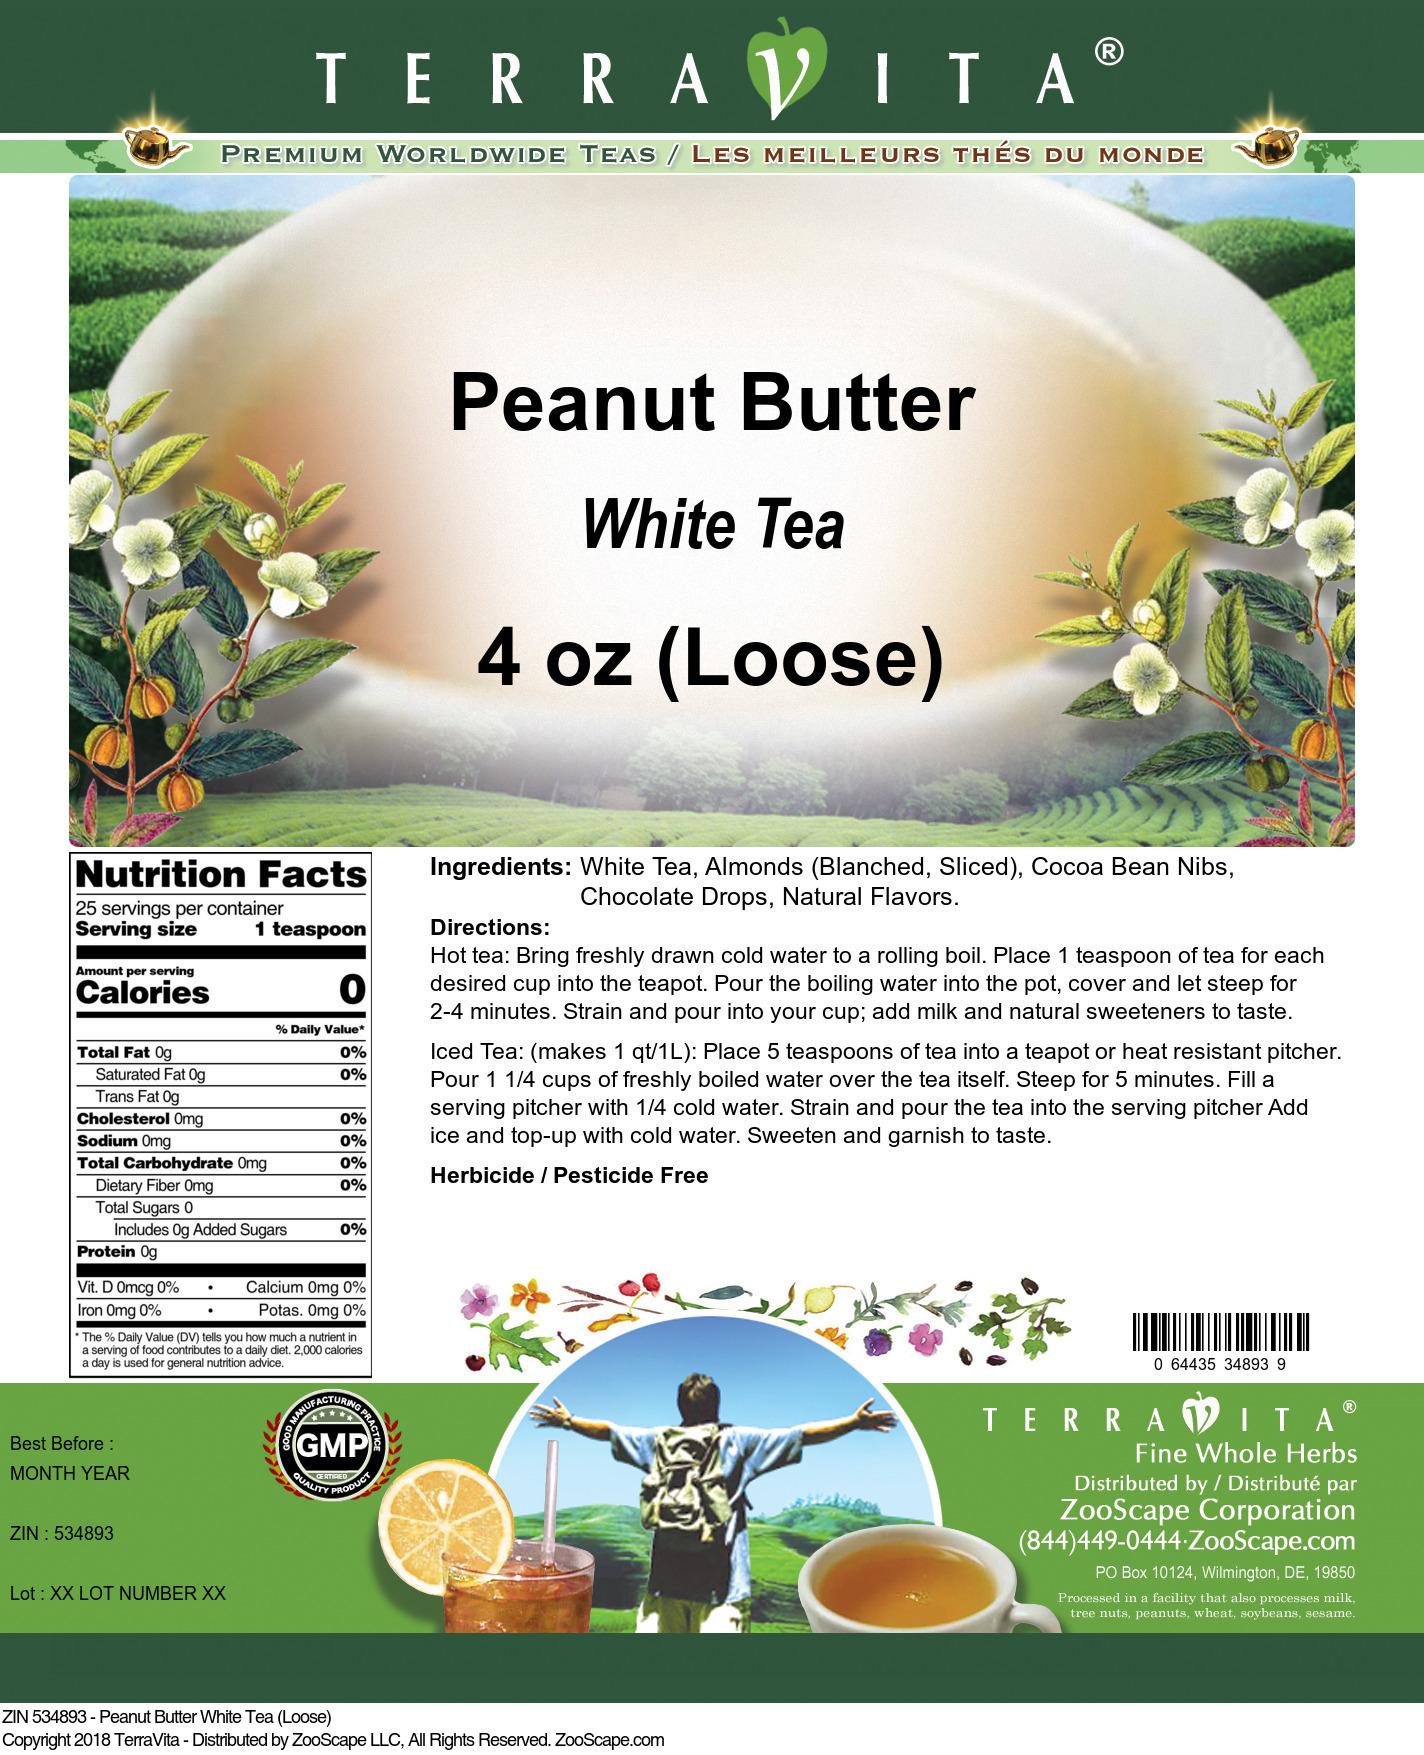 Peanut Butter White Tea (Loose)